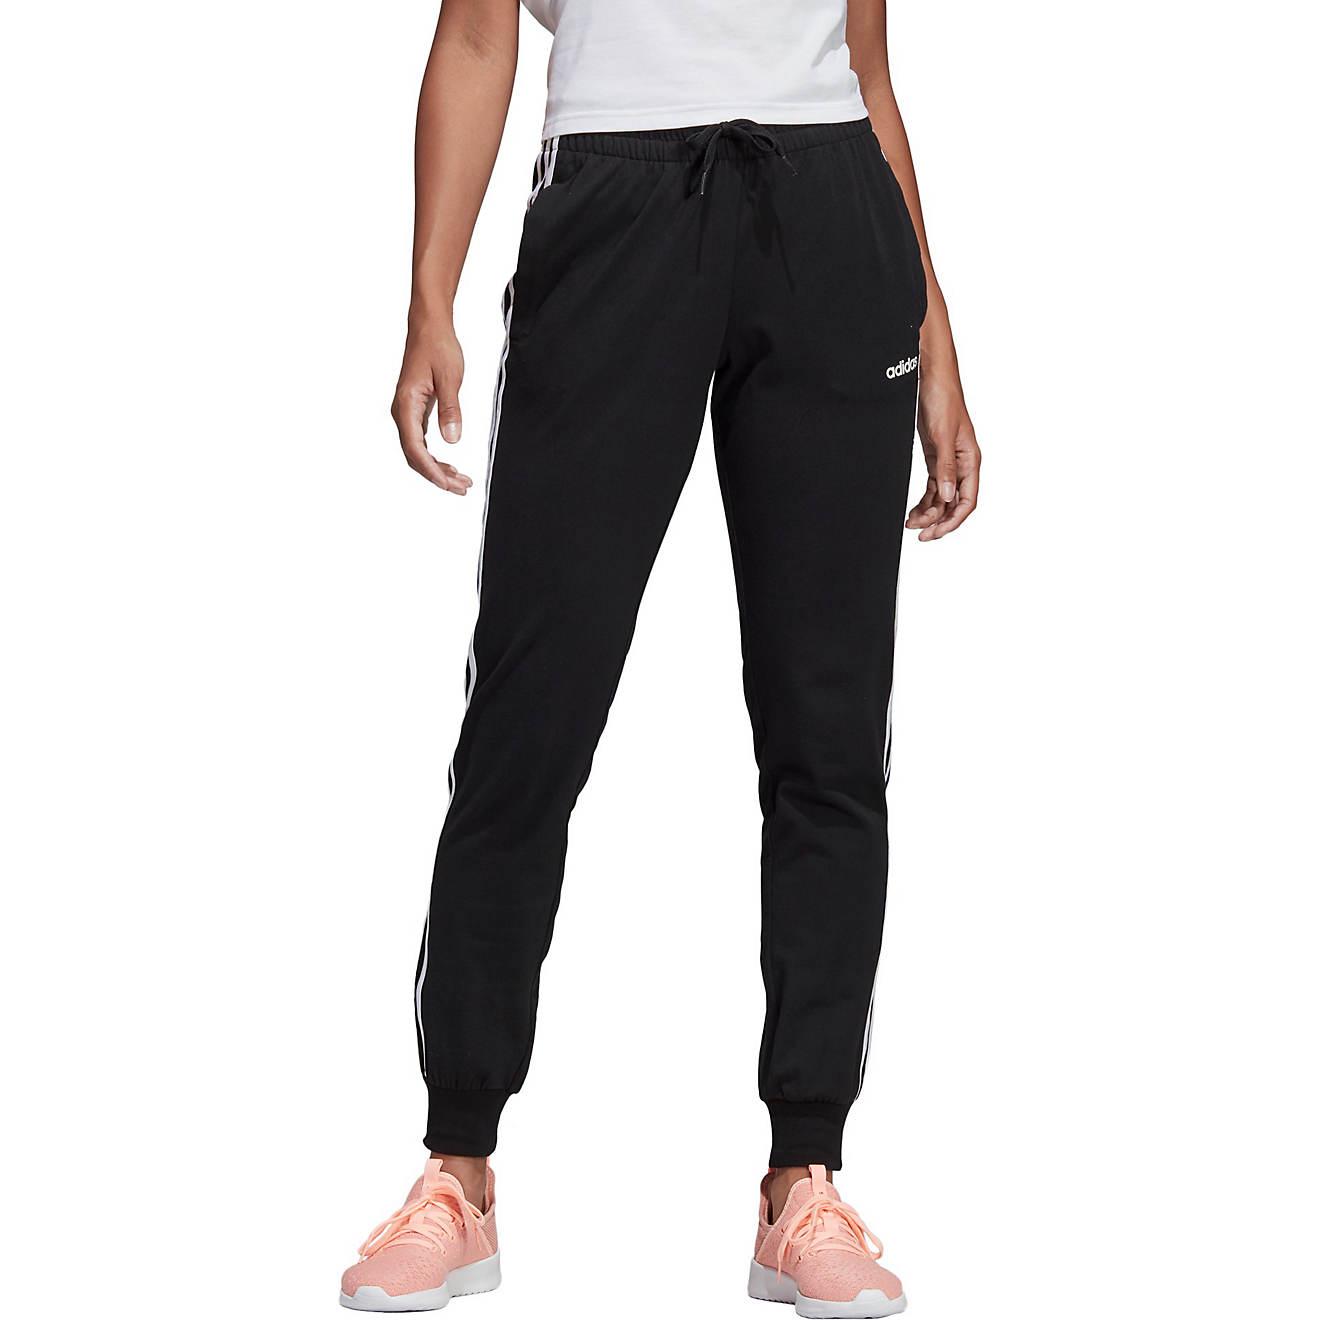 adidas Women's 3-Stripes Single Jersey Pants | Academy